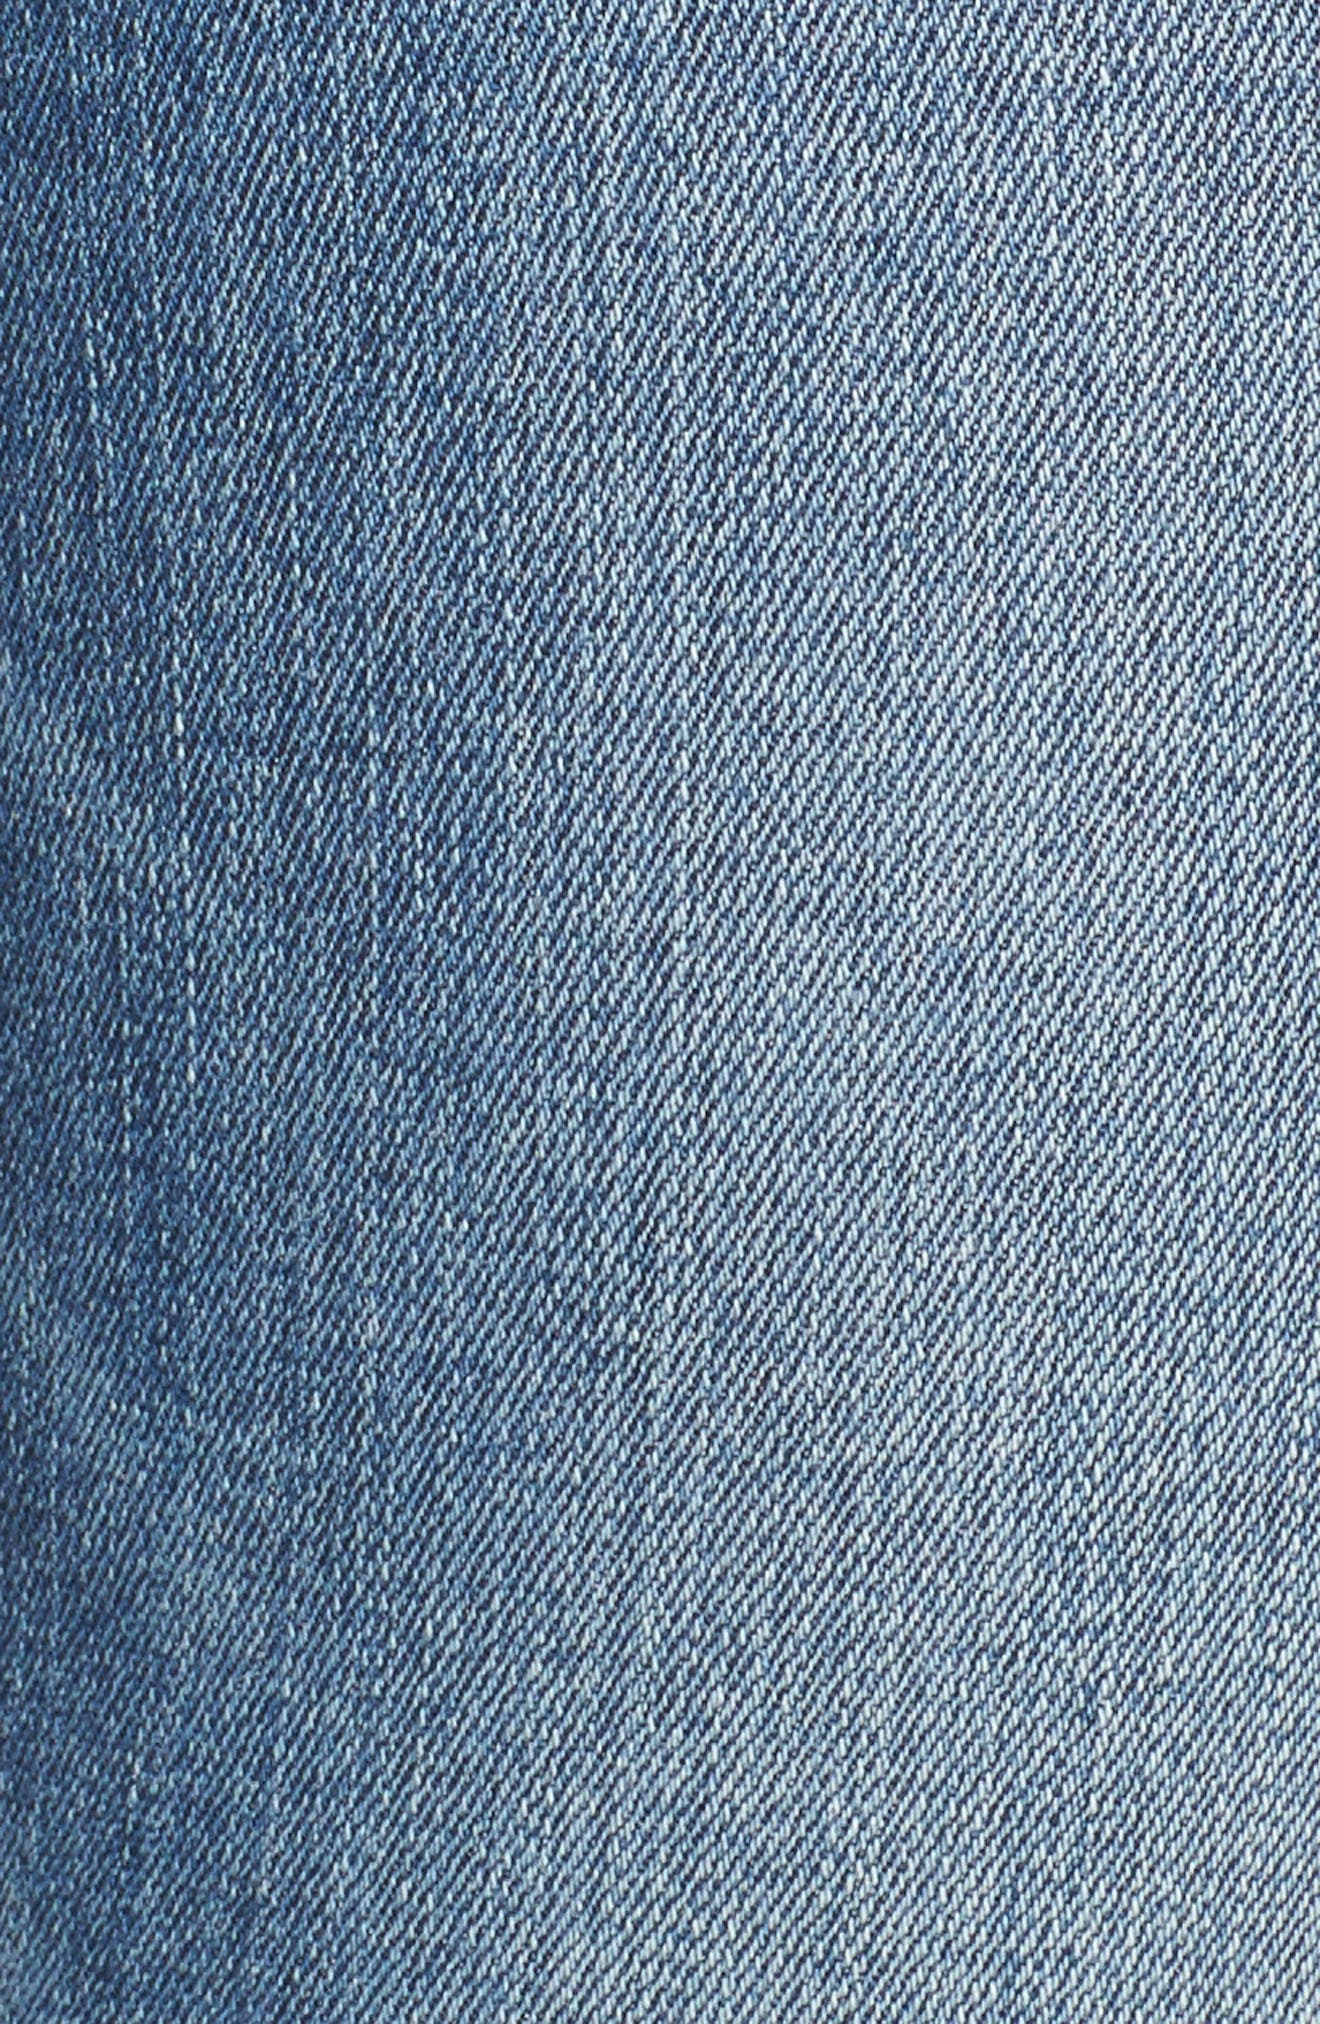 Transcend Vintage - Leggy Ultra Skinny Jeans,                             Alternate thumbnail 6, color,                             400